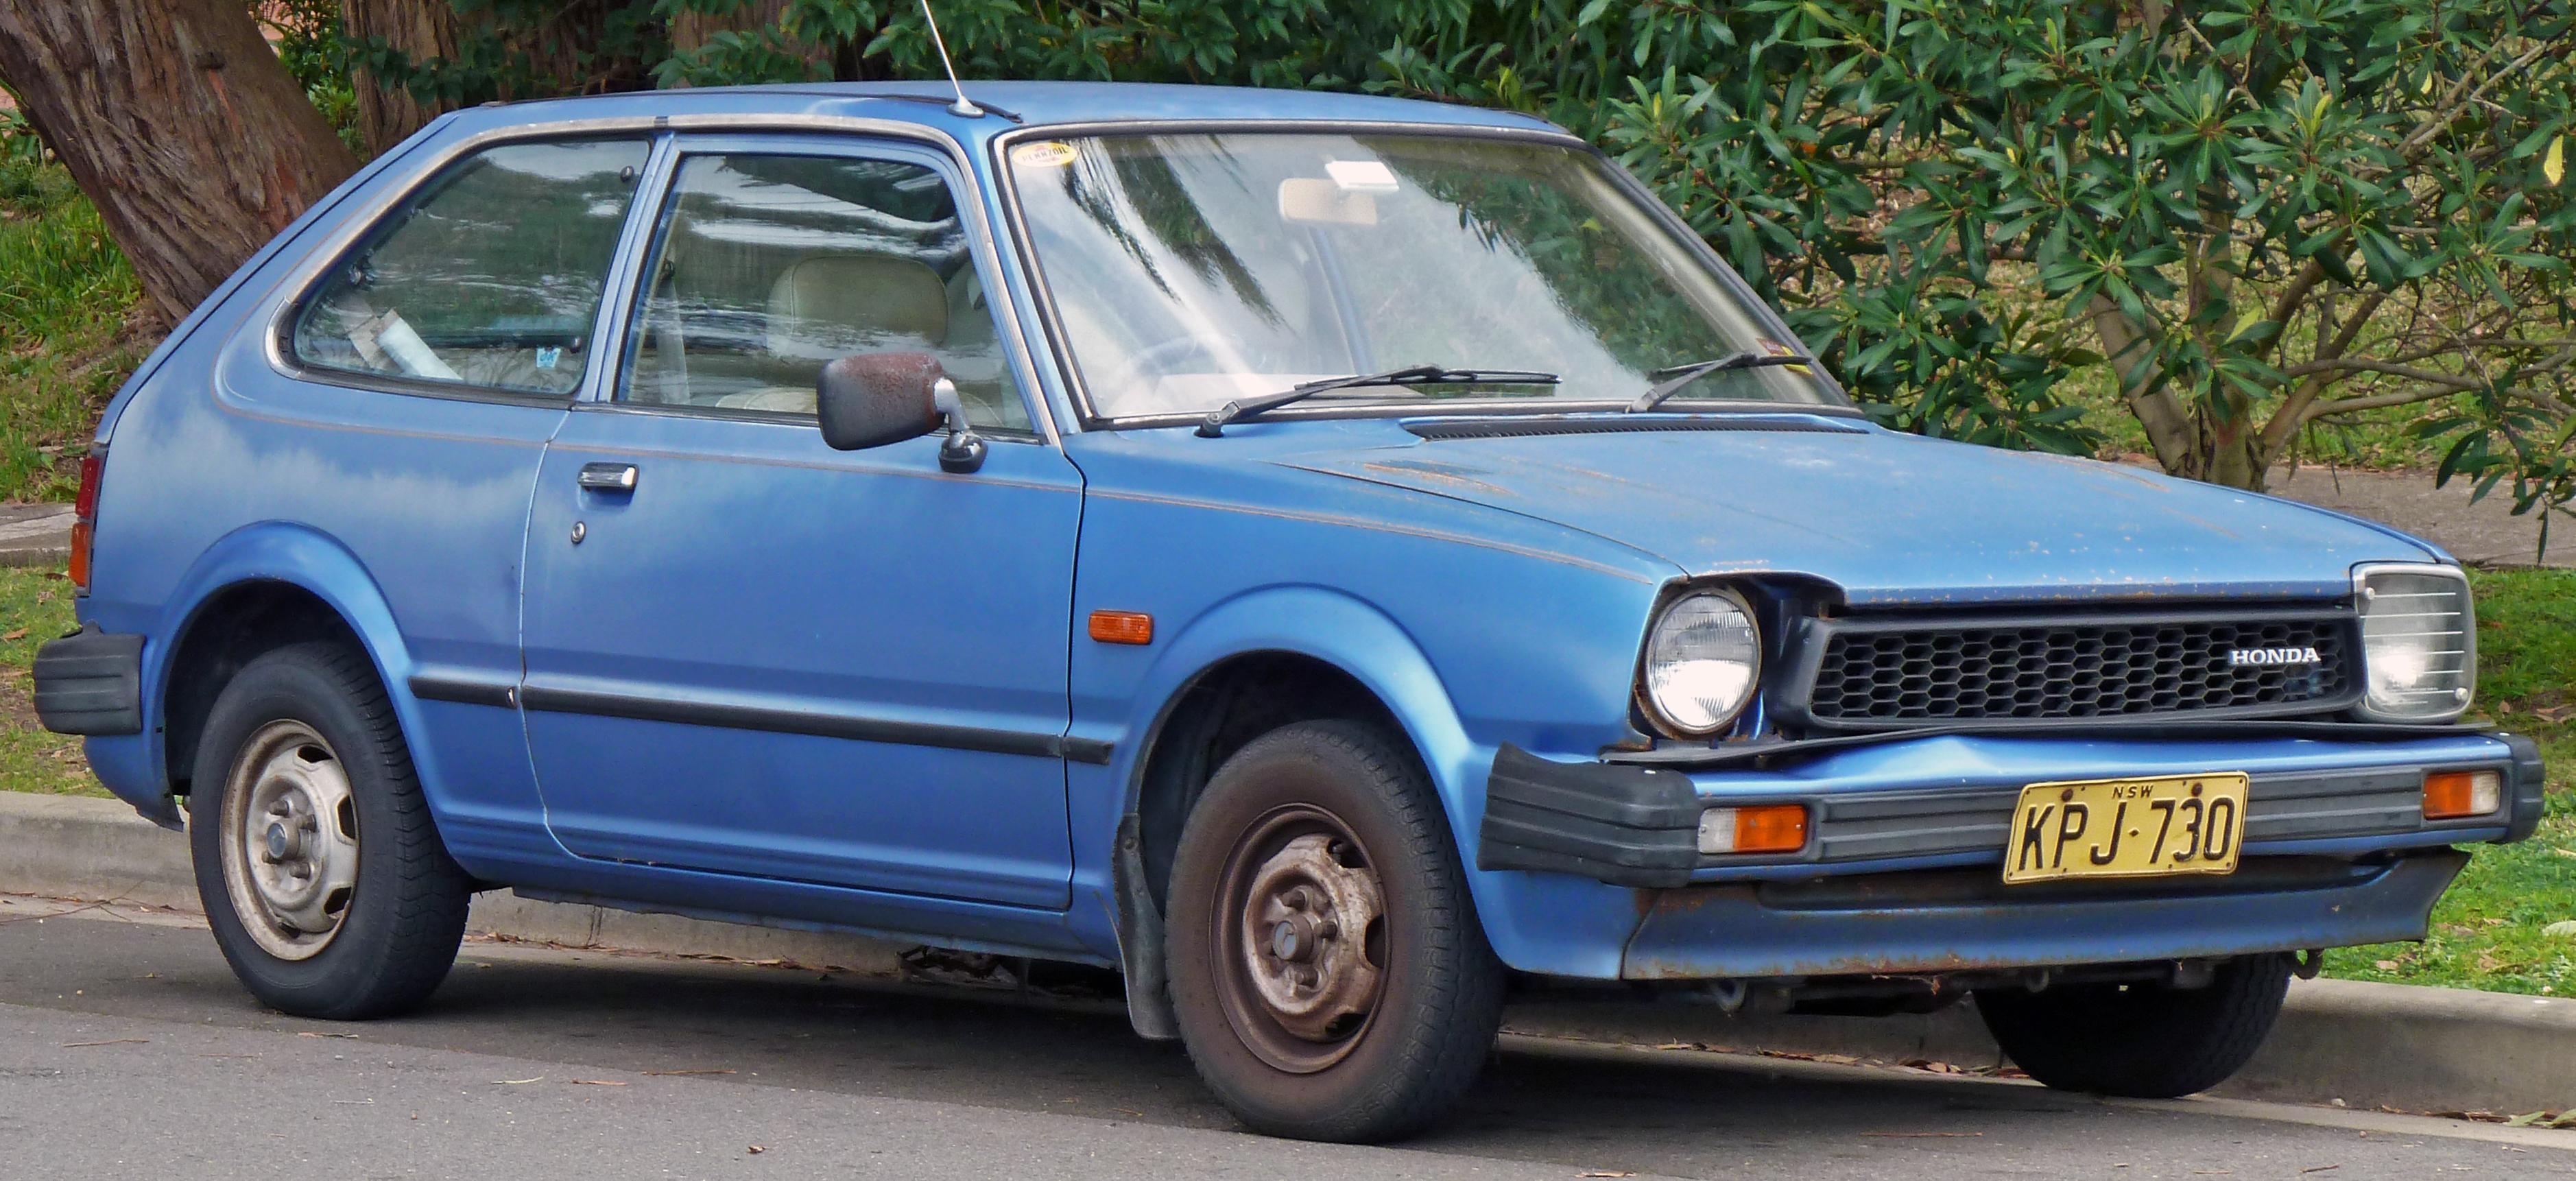 1979 honda civic 1200 hatchback